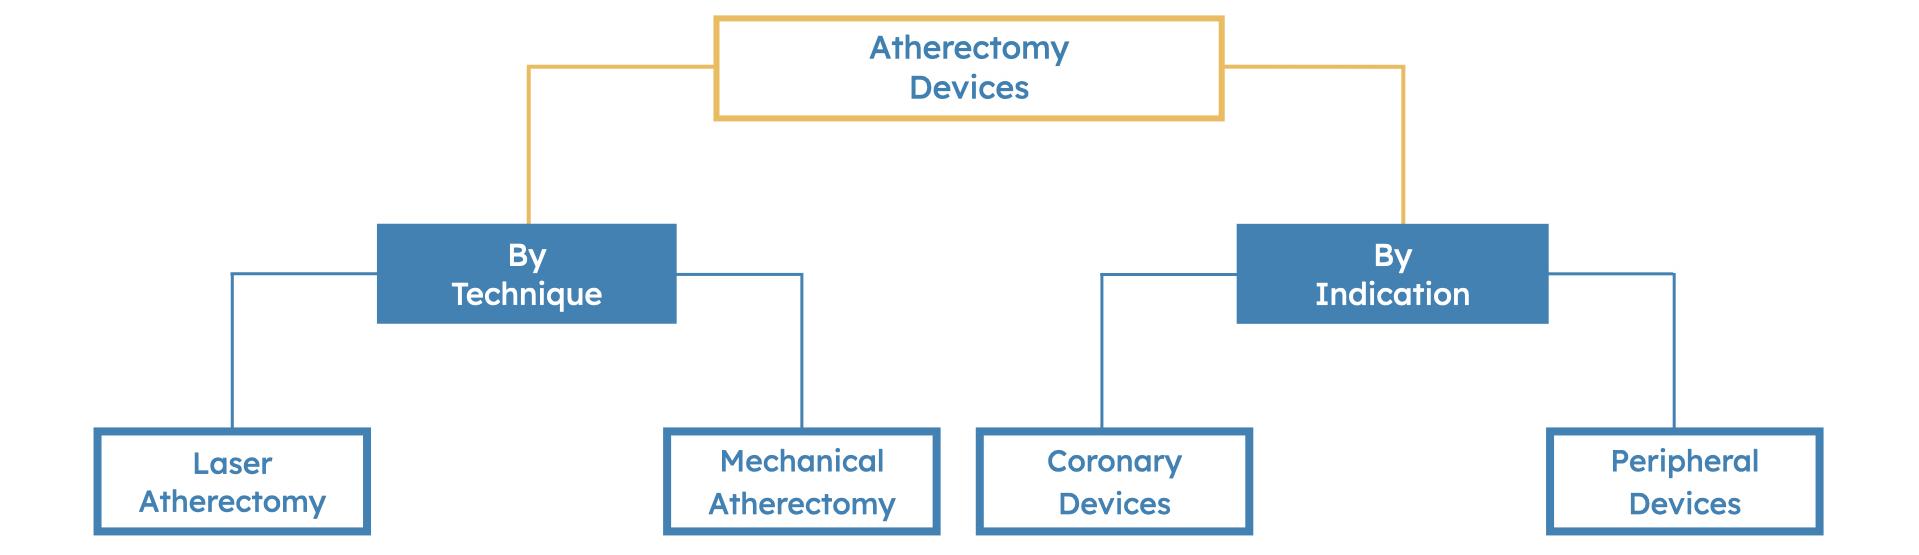 Atherectomy Market Segmentation Summary